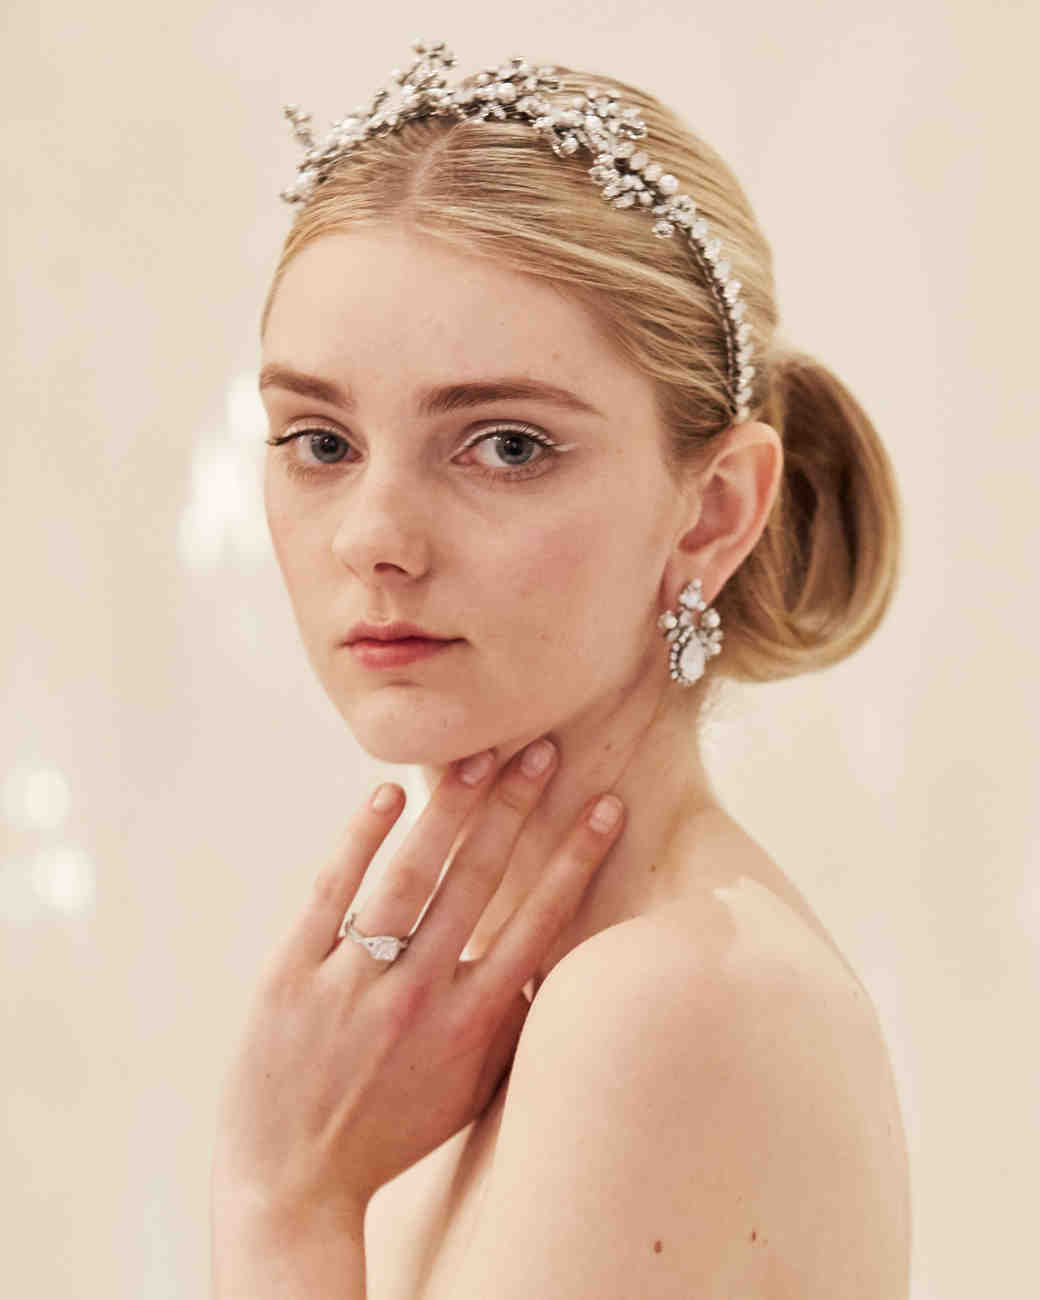 bridal-hair-adornments-spring2016-marchesa-0415.jpg